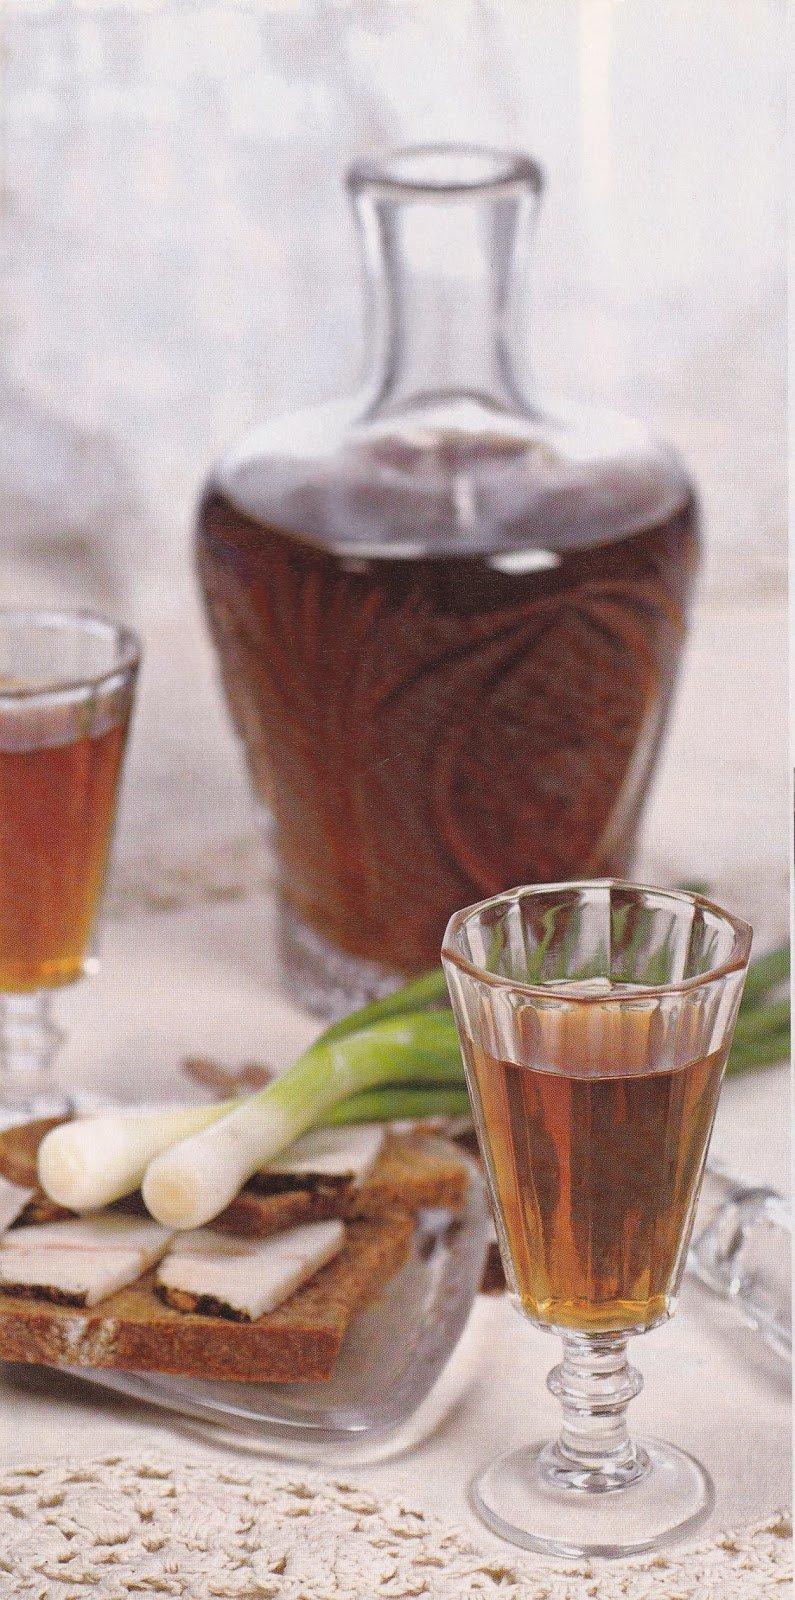 Рецепты наливок на водке в домашних условиях